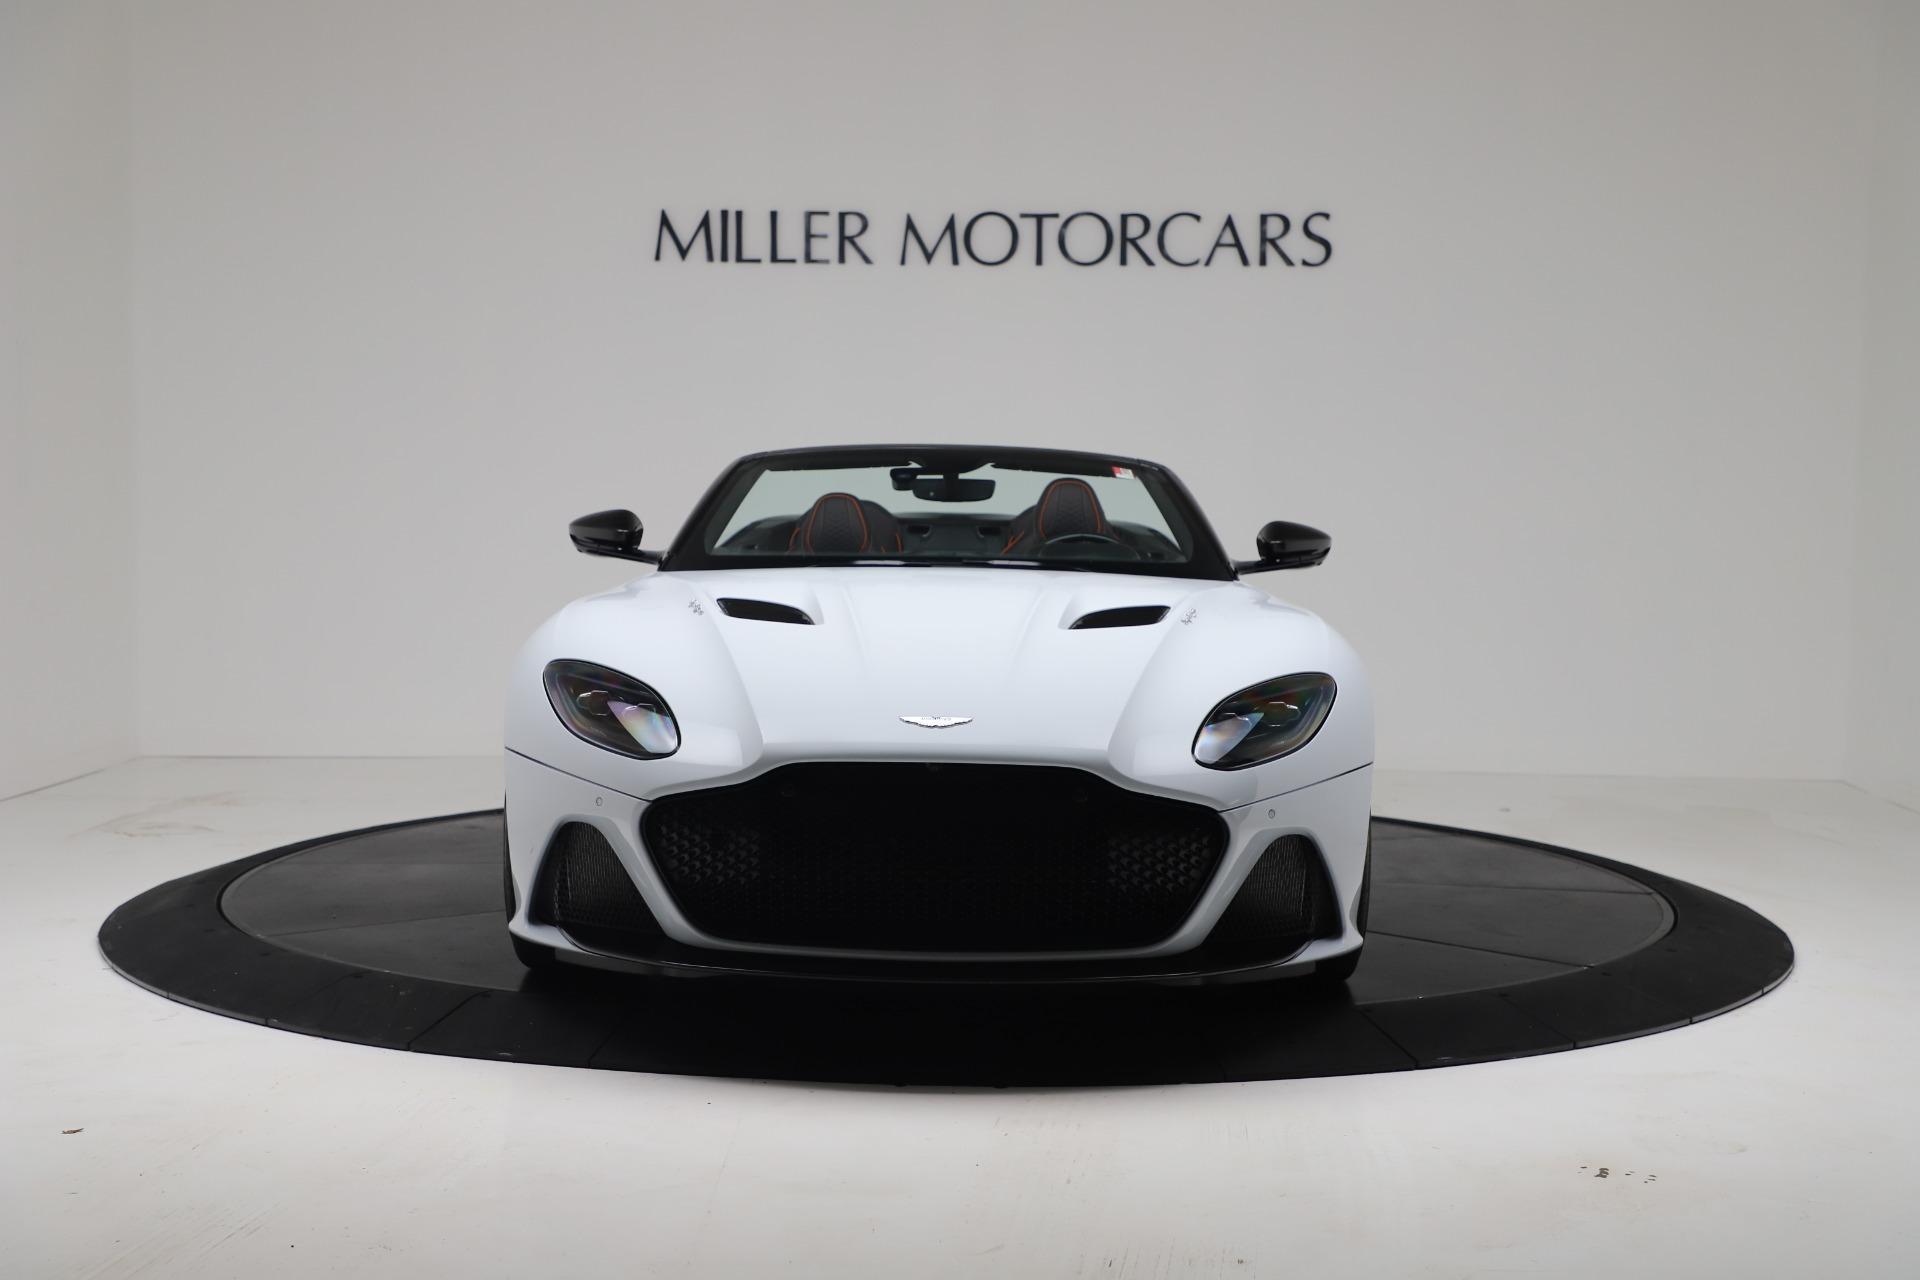 New 2020 Aston Martin DBS Superleggera For Sale In Greenwich, CT 3484_p11